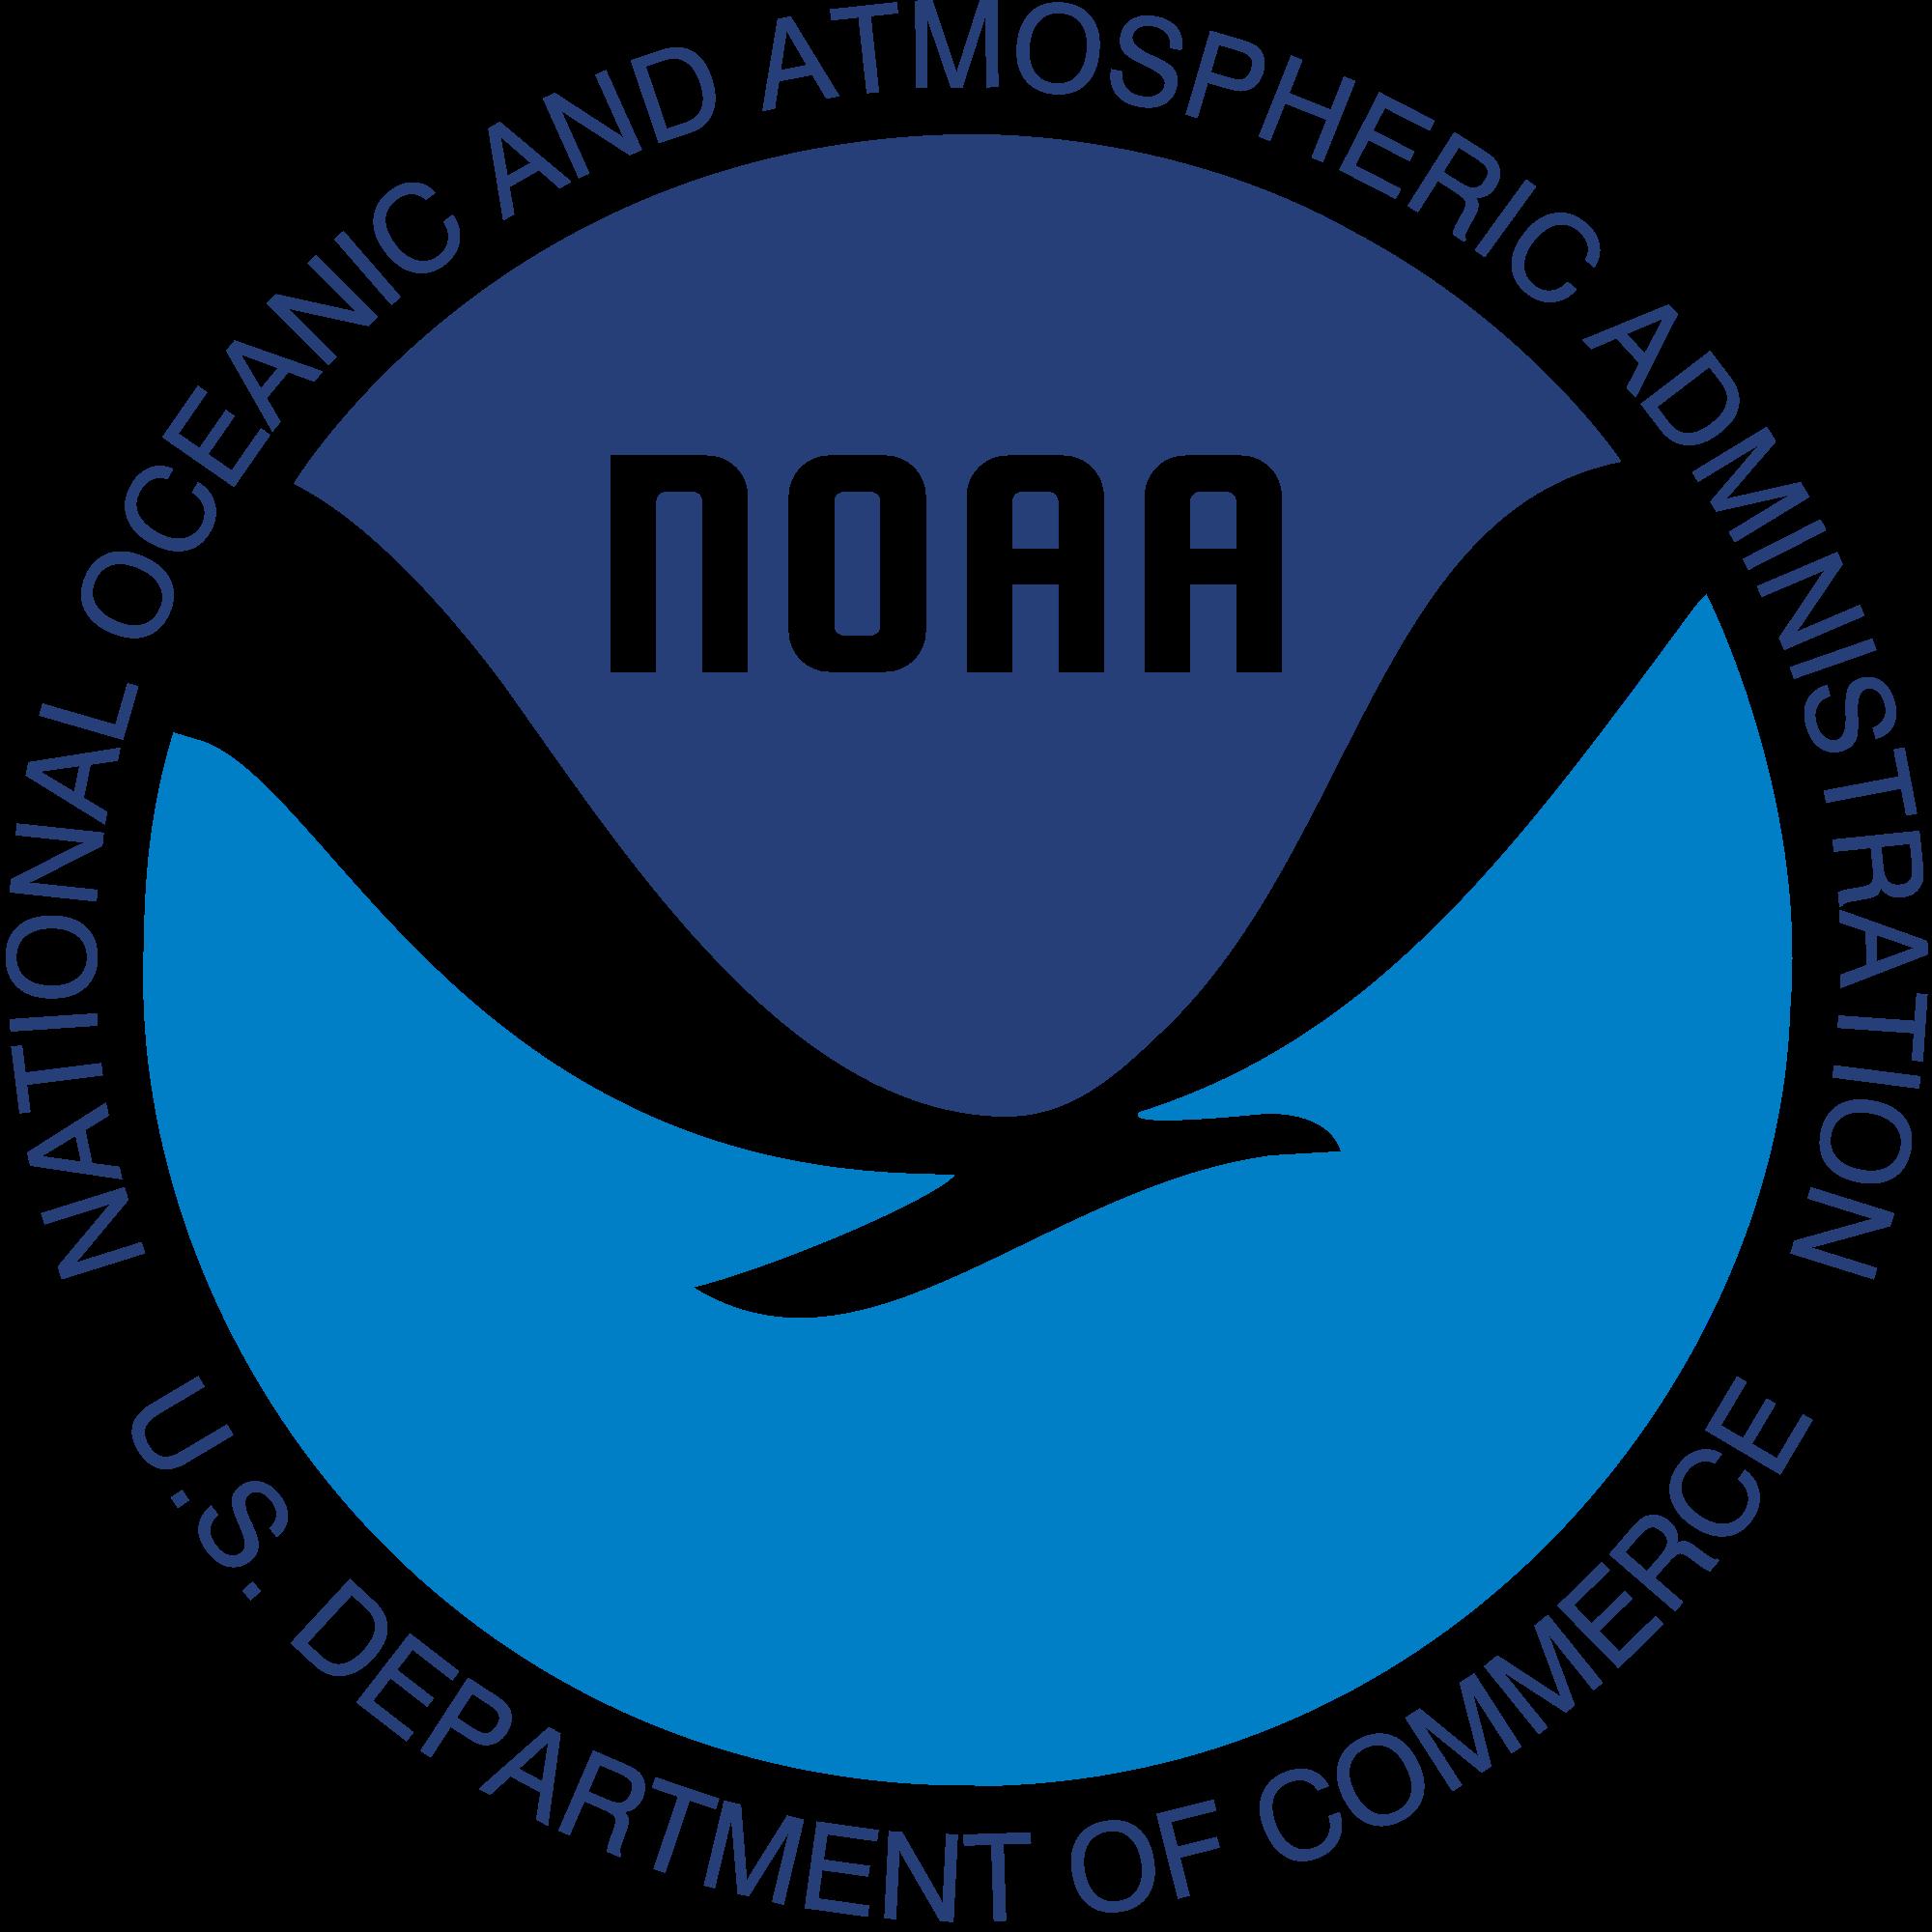 noaa-logo.png